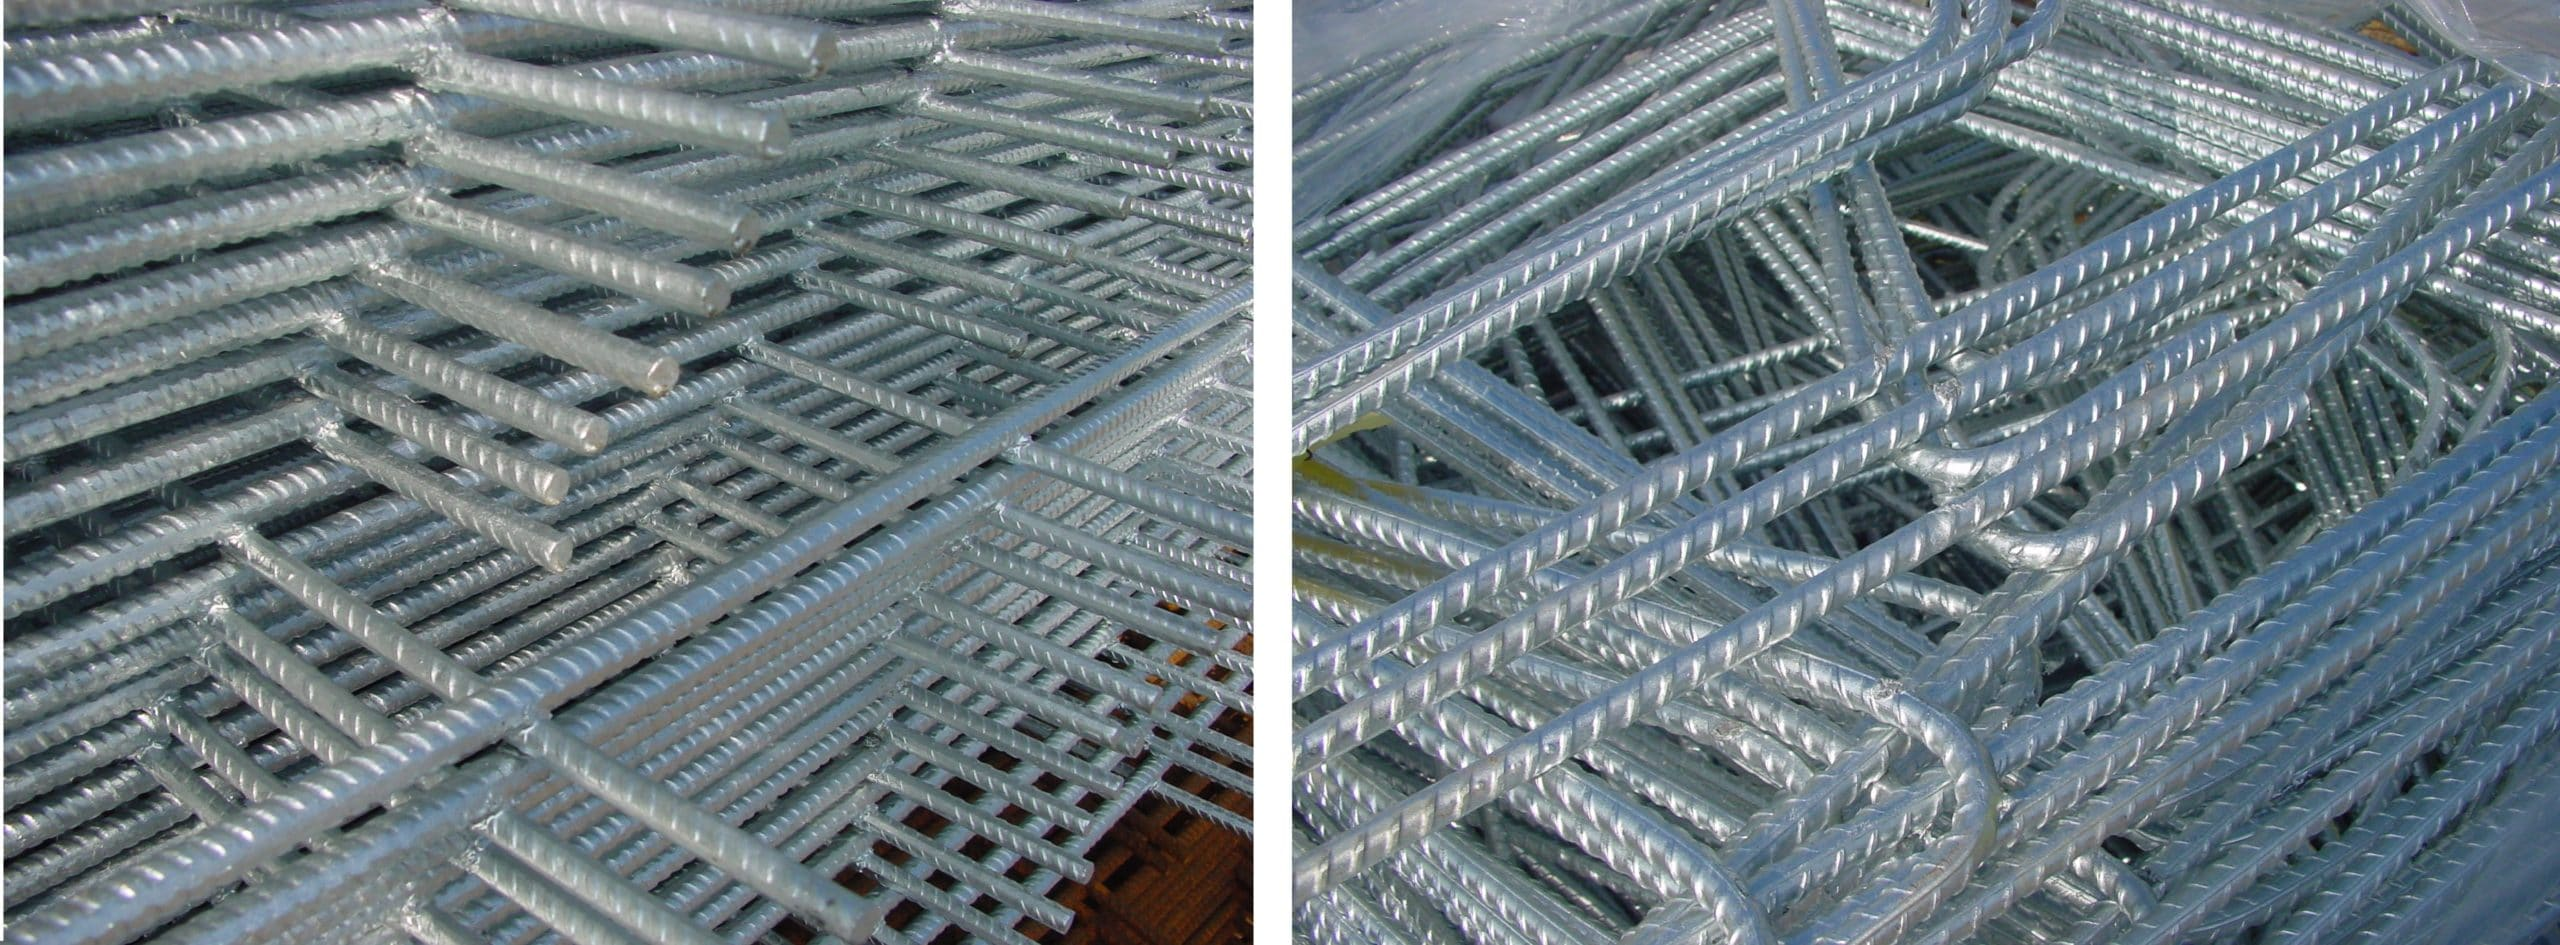 Stainless Steel & Galvanised Reinforcement